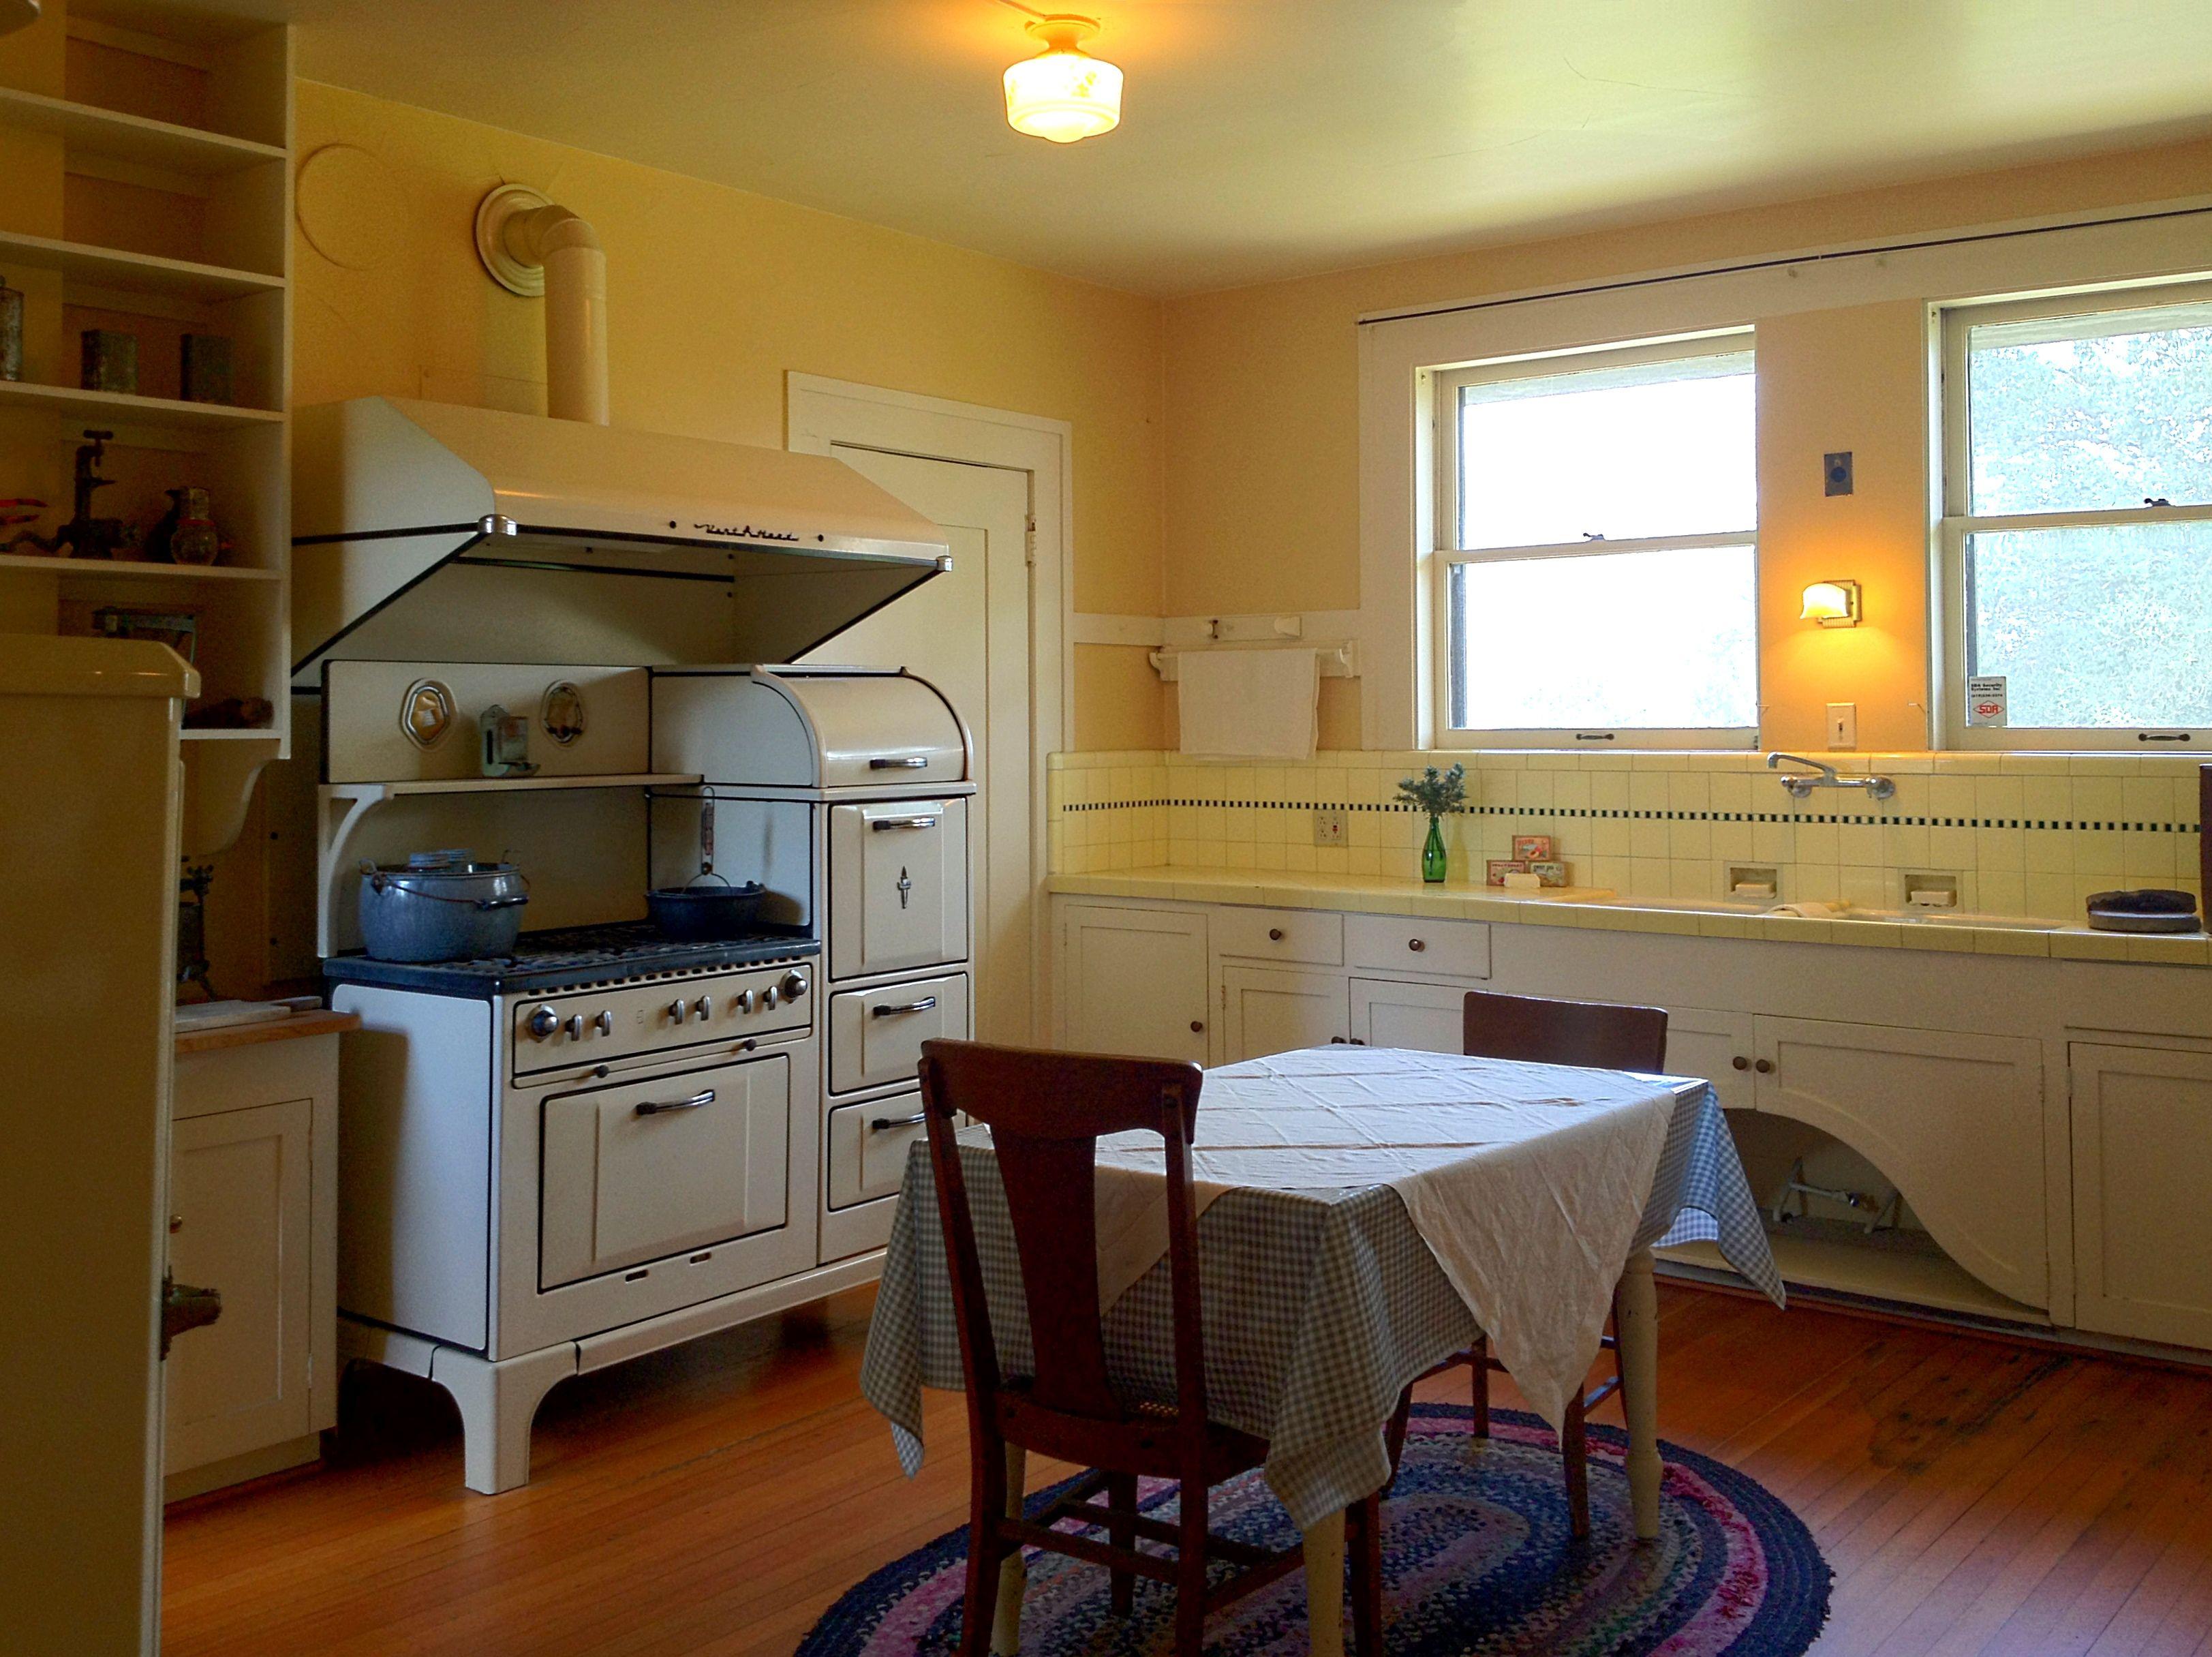 San Diego S Marston House An Arts Crafts Gem Hidden In Plain Sight The Craftsman Bungalow Vintage Kitchen Craftsman Kitchen Bungalow Interiors